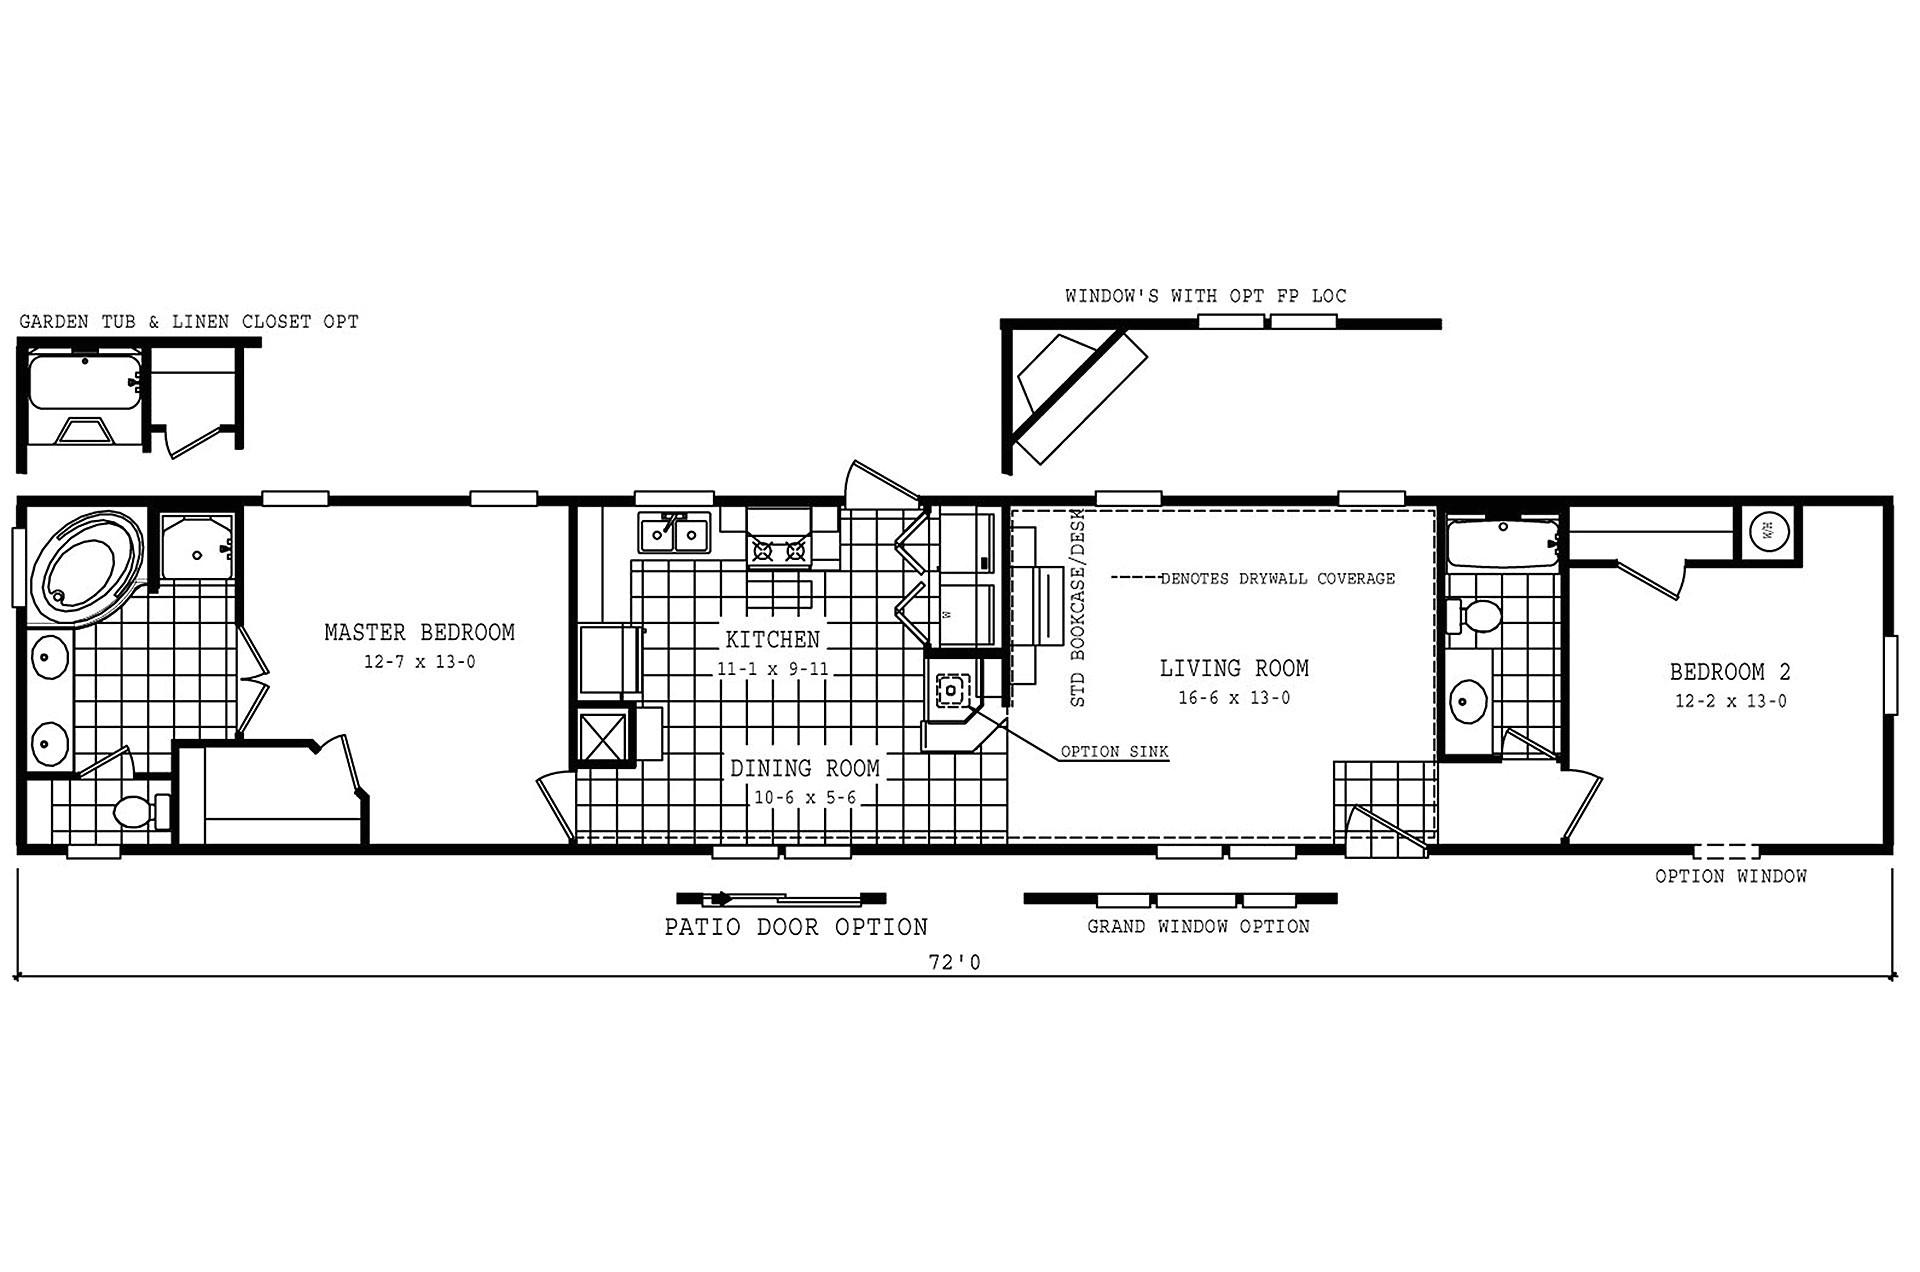 oakwood mobile home floor plans manufacturedhomefloorplans 231038